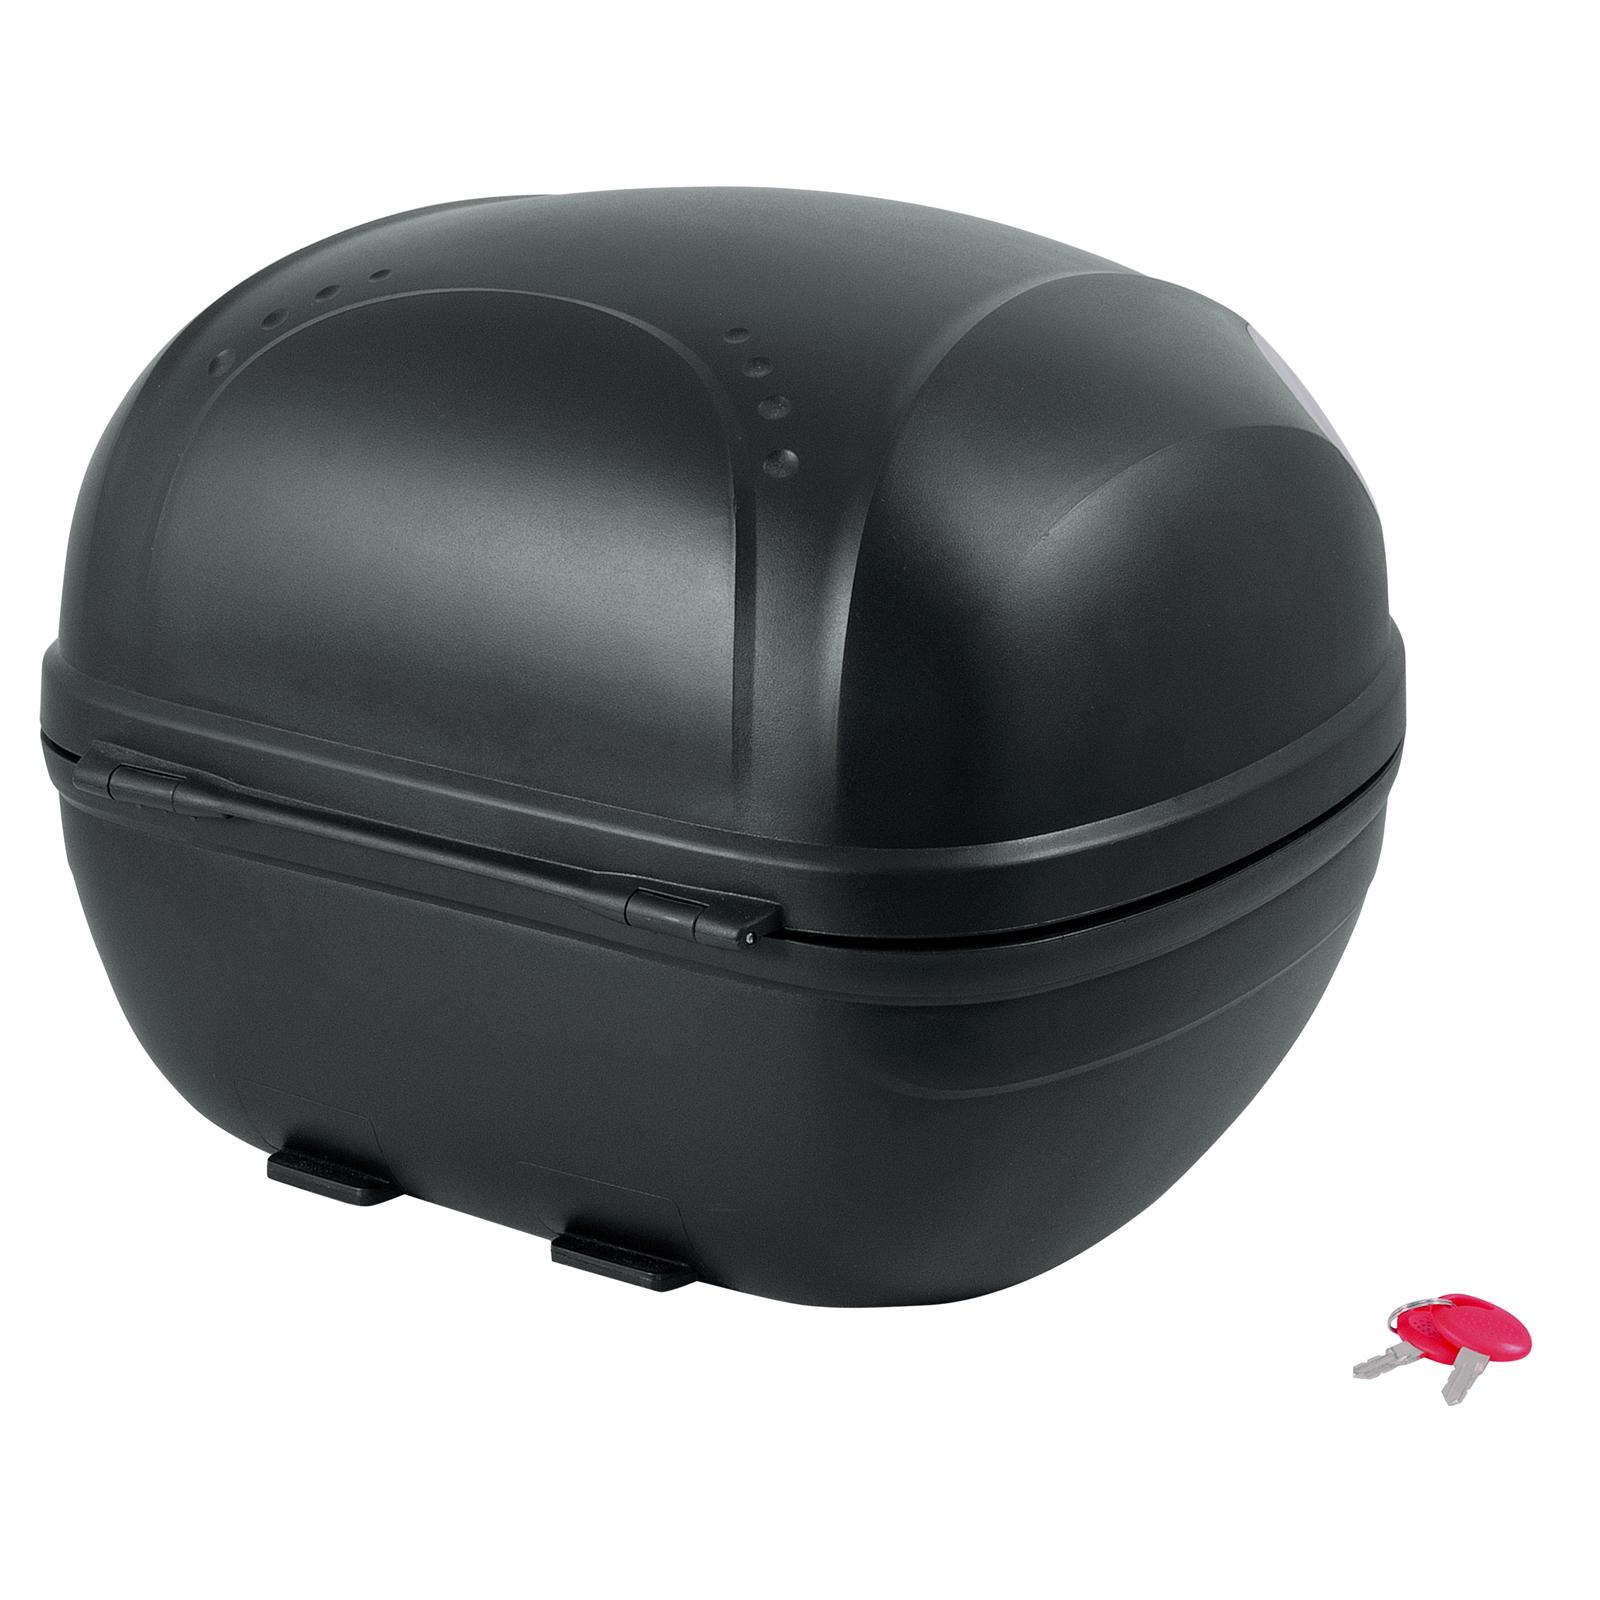 top case gepaeck tasche motorrad roller universal 30lt. Black Bedroom Furniture Sets. Home Design Ideas